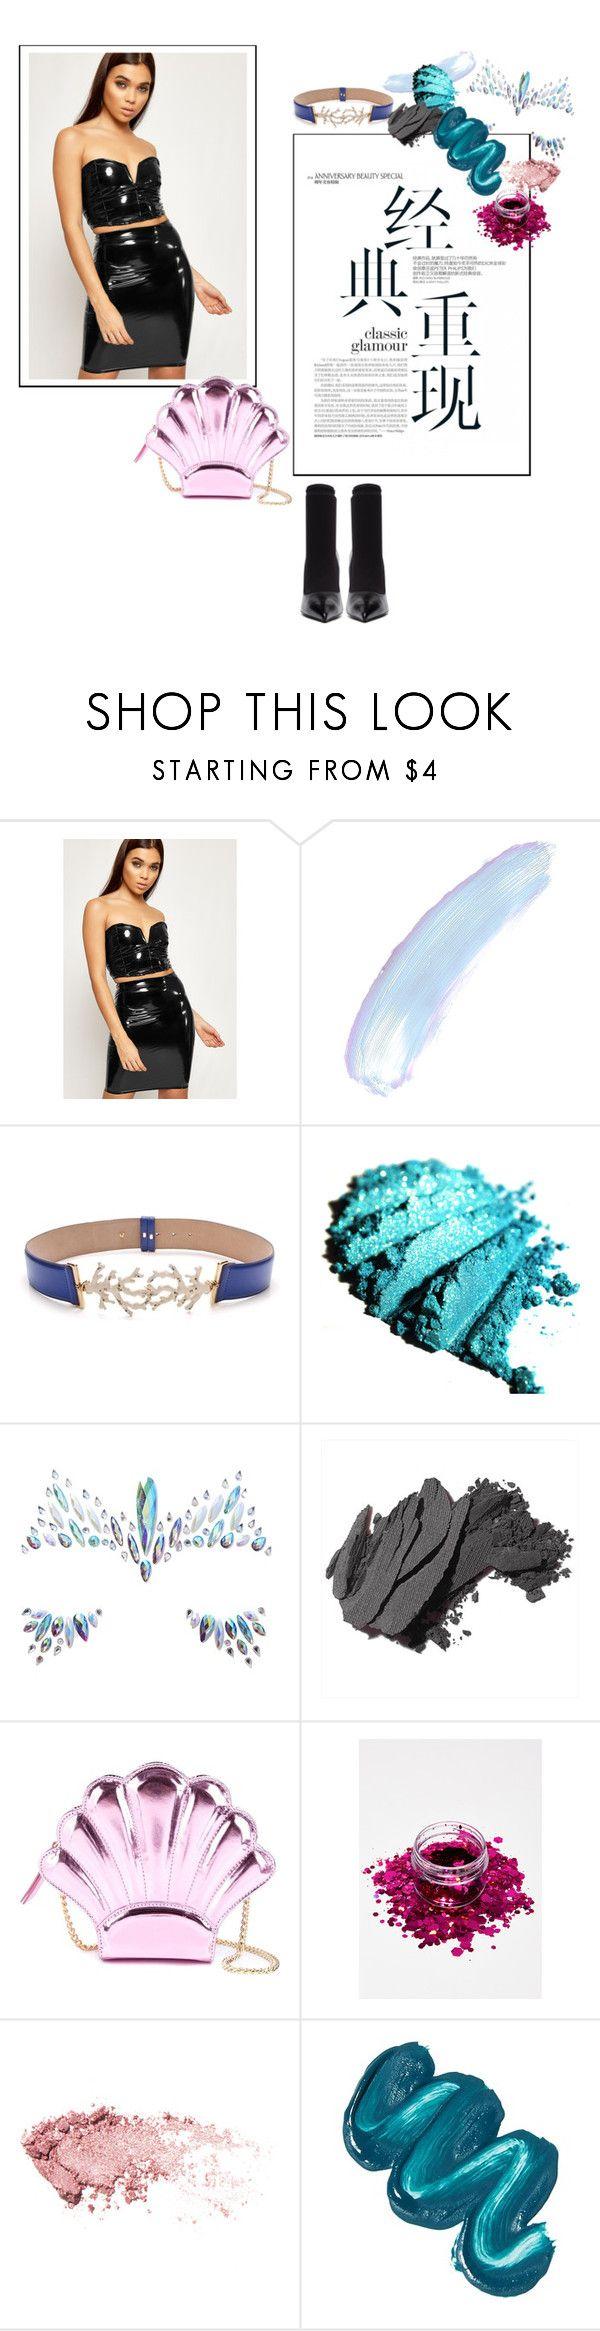 """Modern Mermaid Halloween Costume"" by wearall ❤ liked on Polyvore featuring WearAll, Blumarine, The Gypsy Shrine, Bobbi Brown Cosmetics, Yazbukey, Mermaid Salon, Balenciaga and modern"